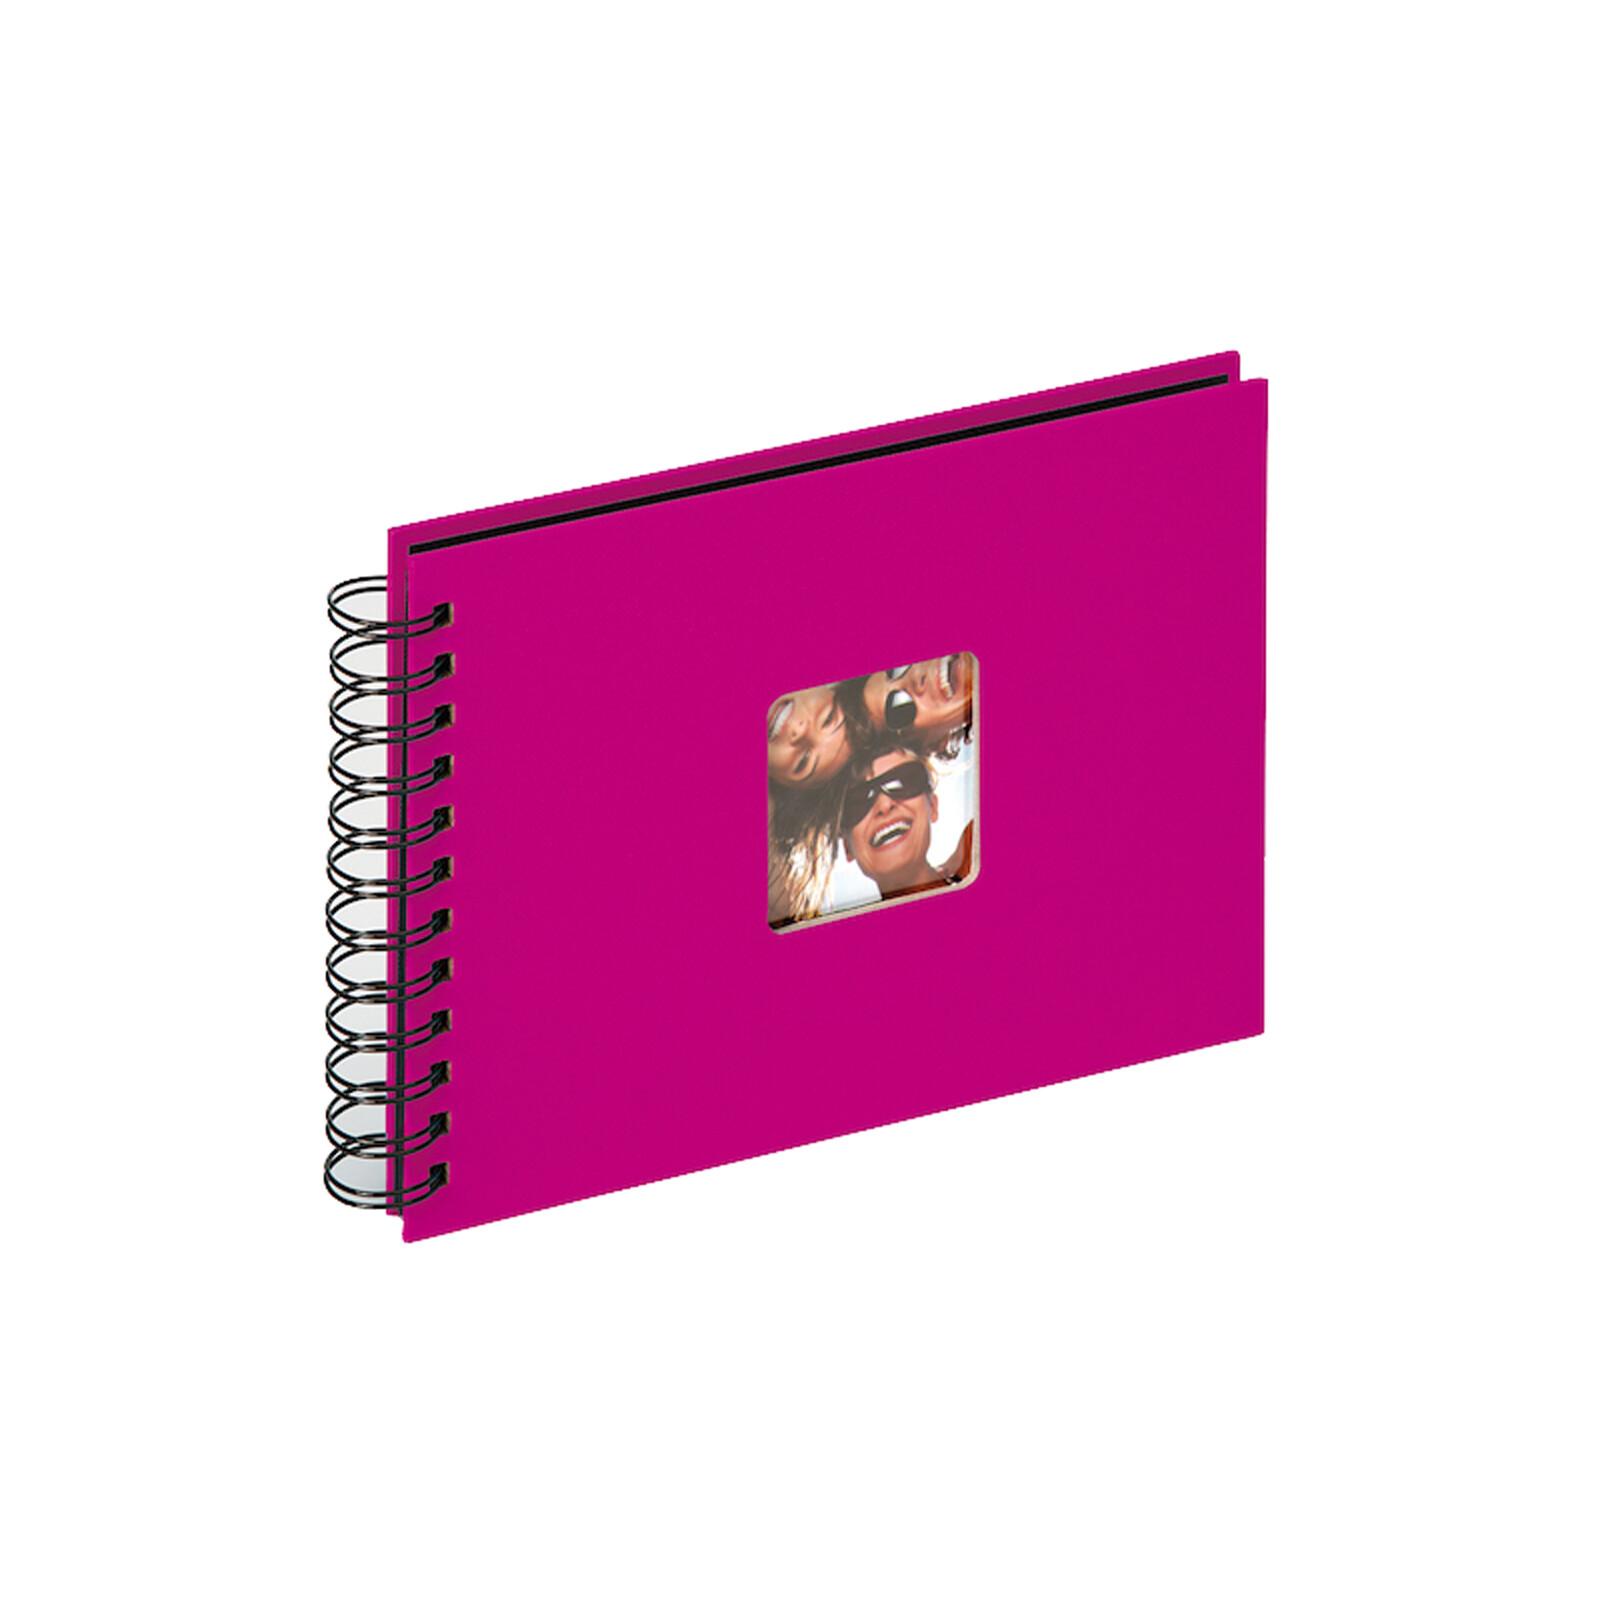 Album SA-109 23x17 40S Fun Pink